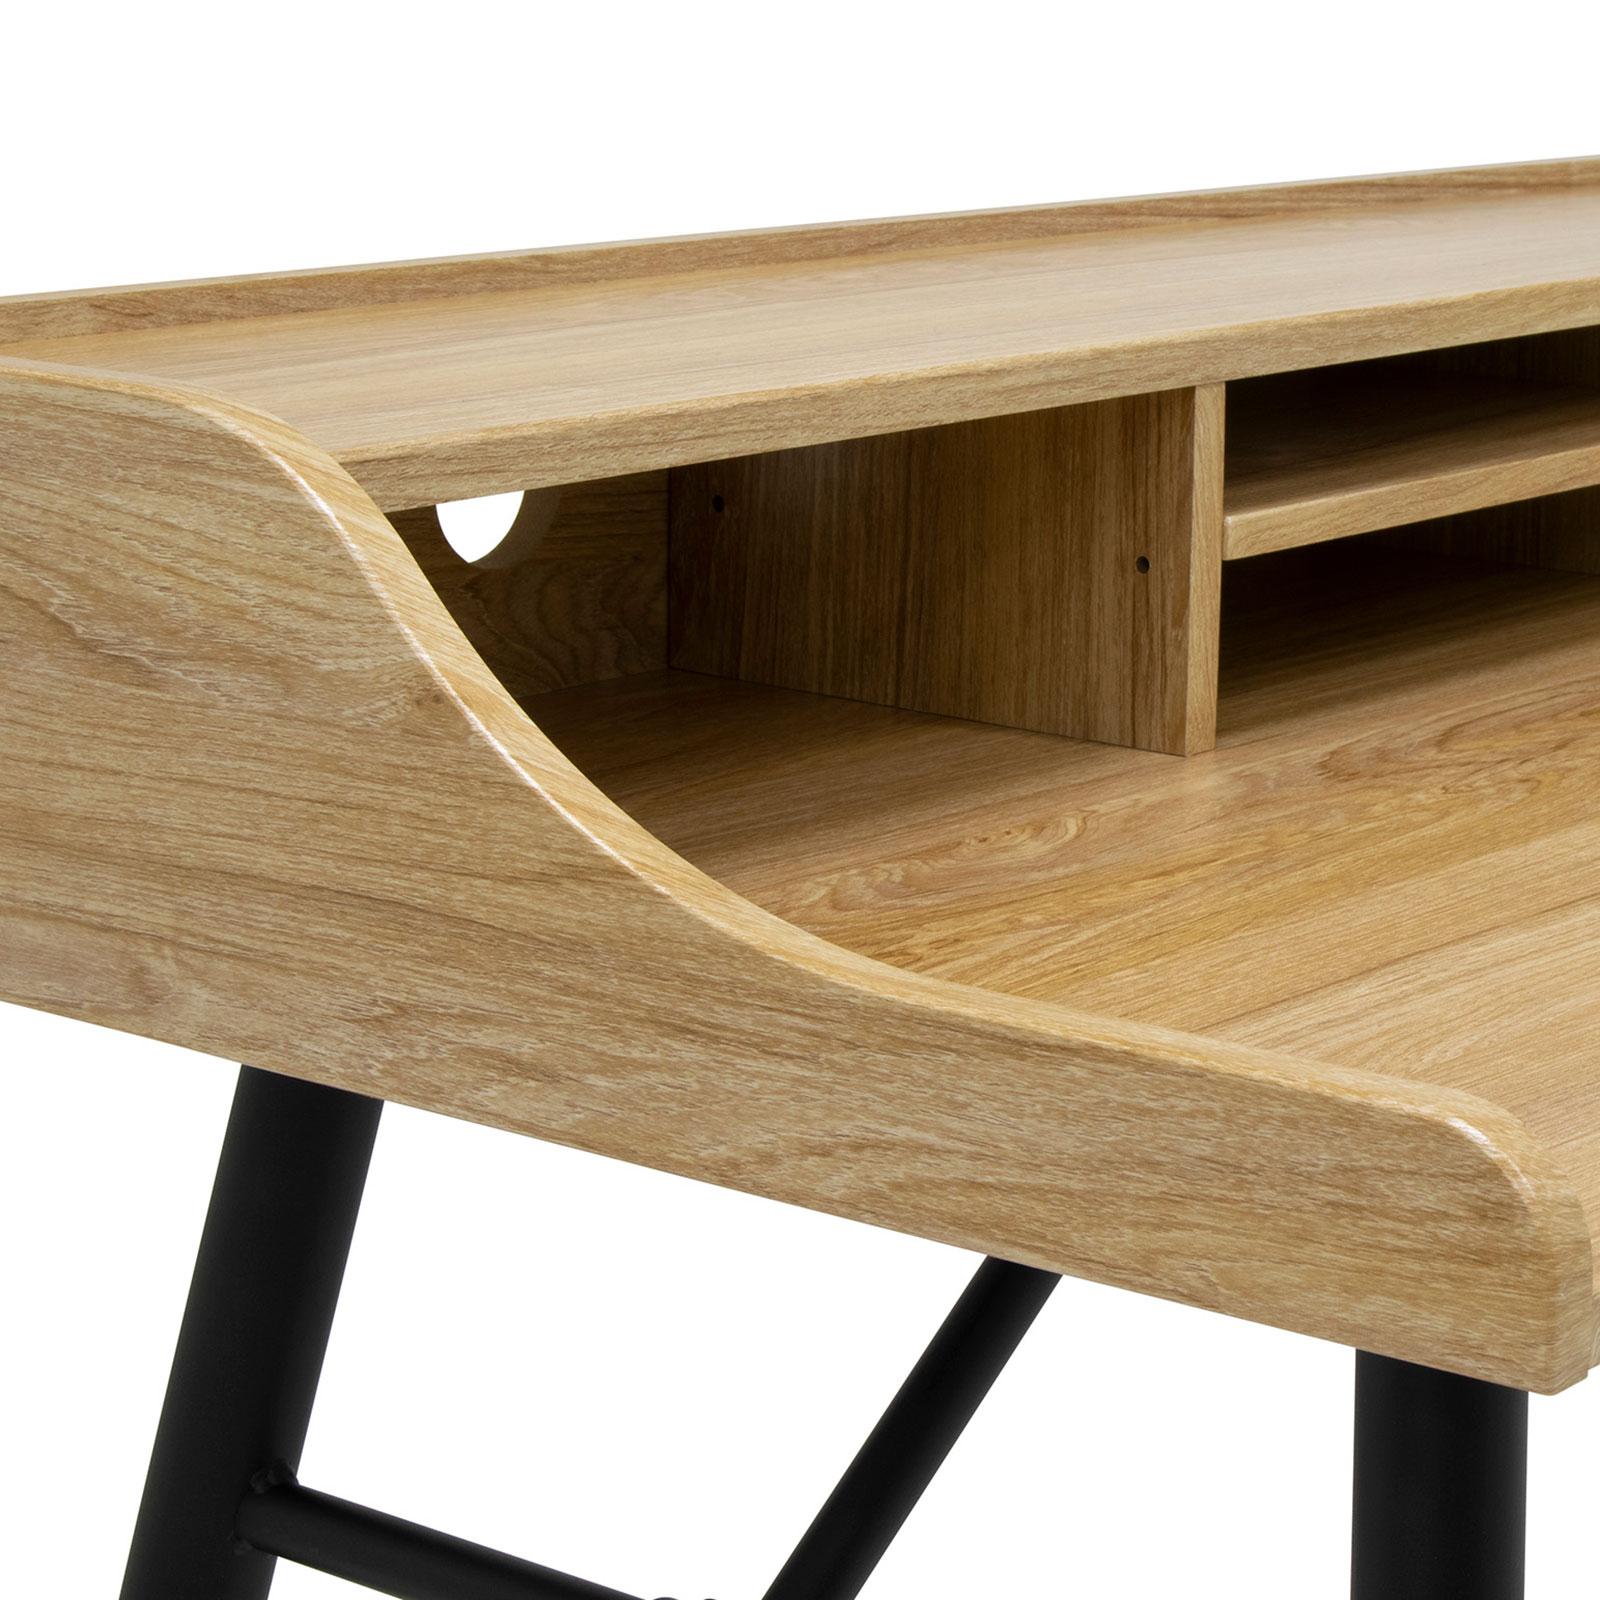 51260-Woodford-Writing-Desk-detail1